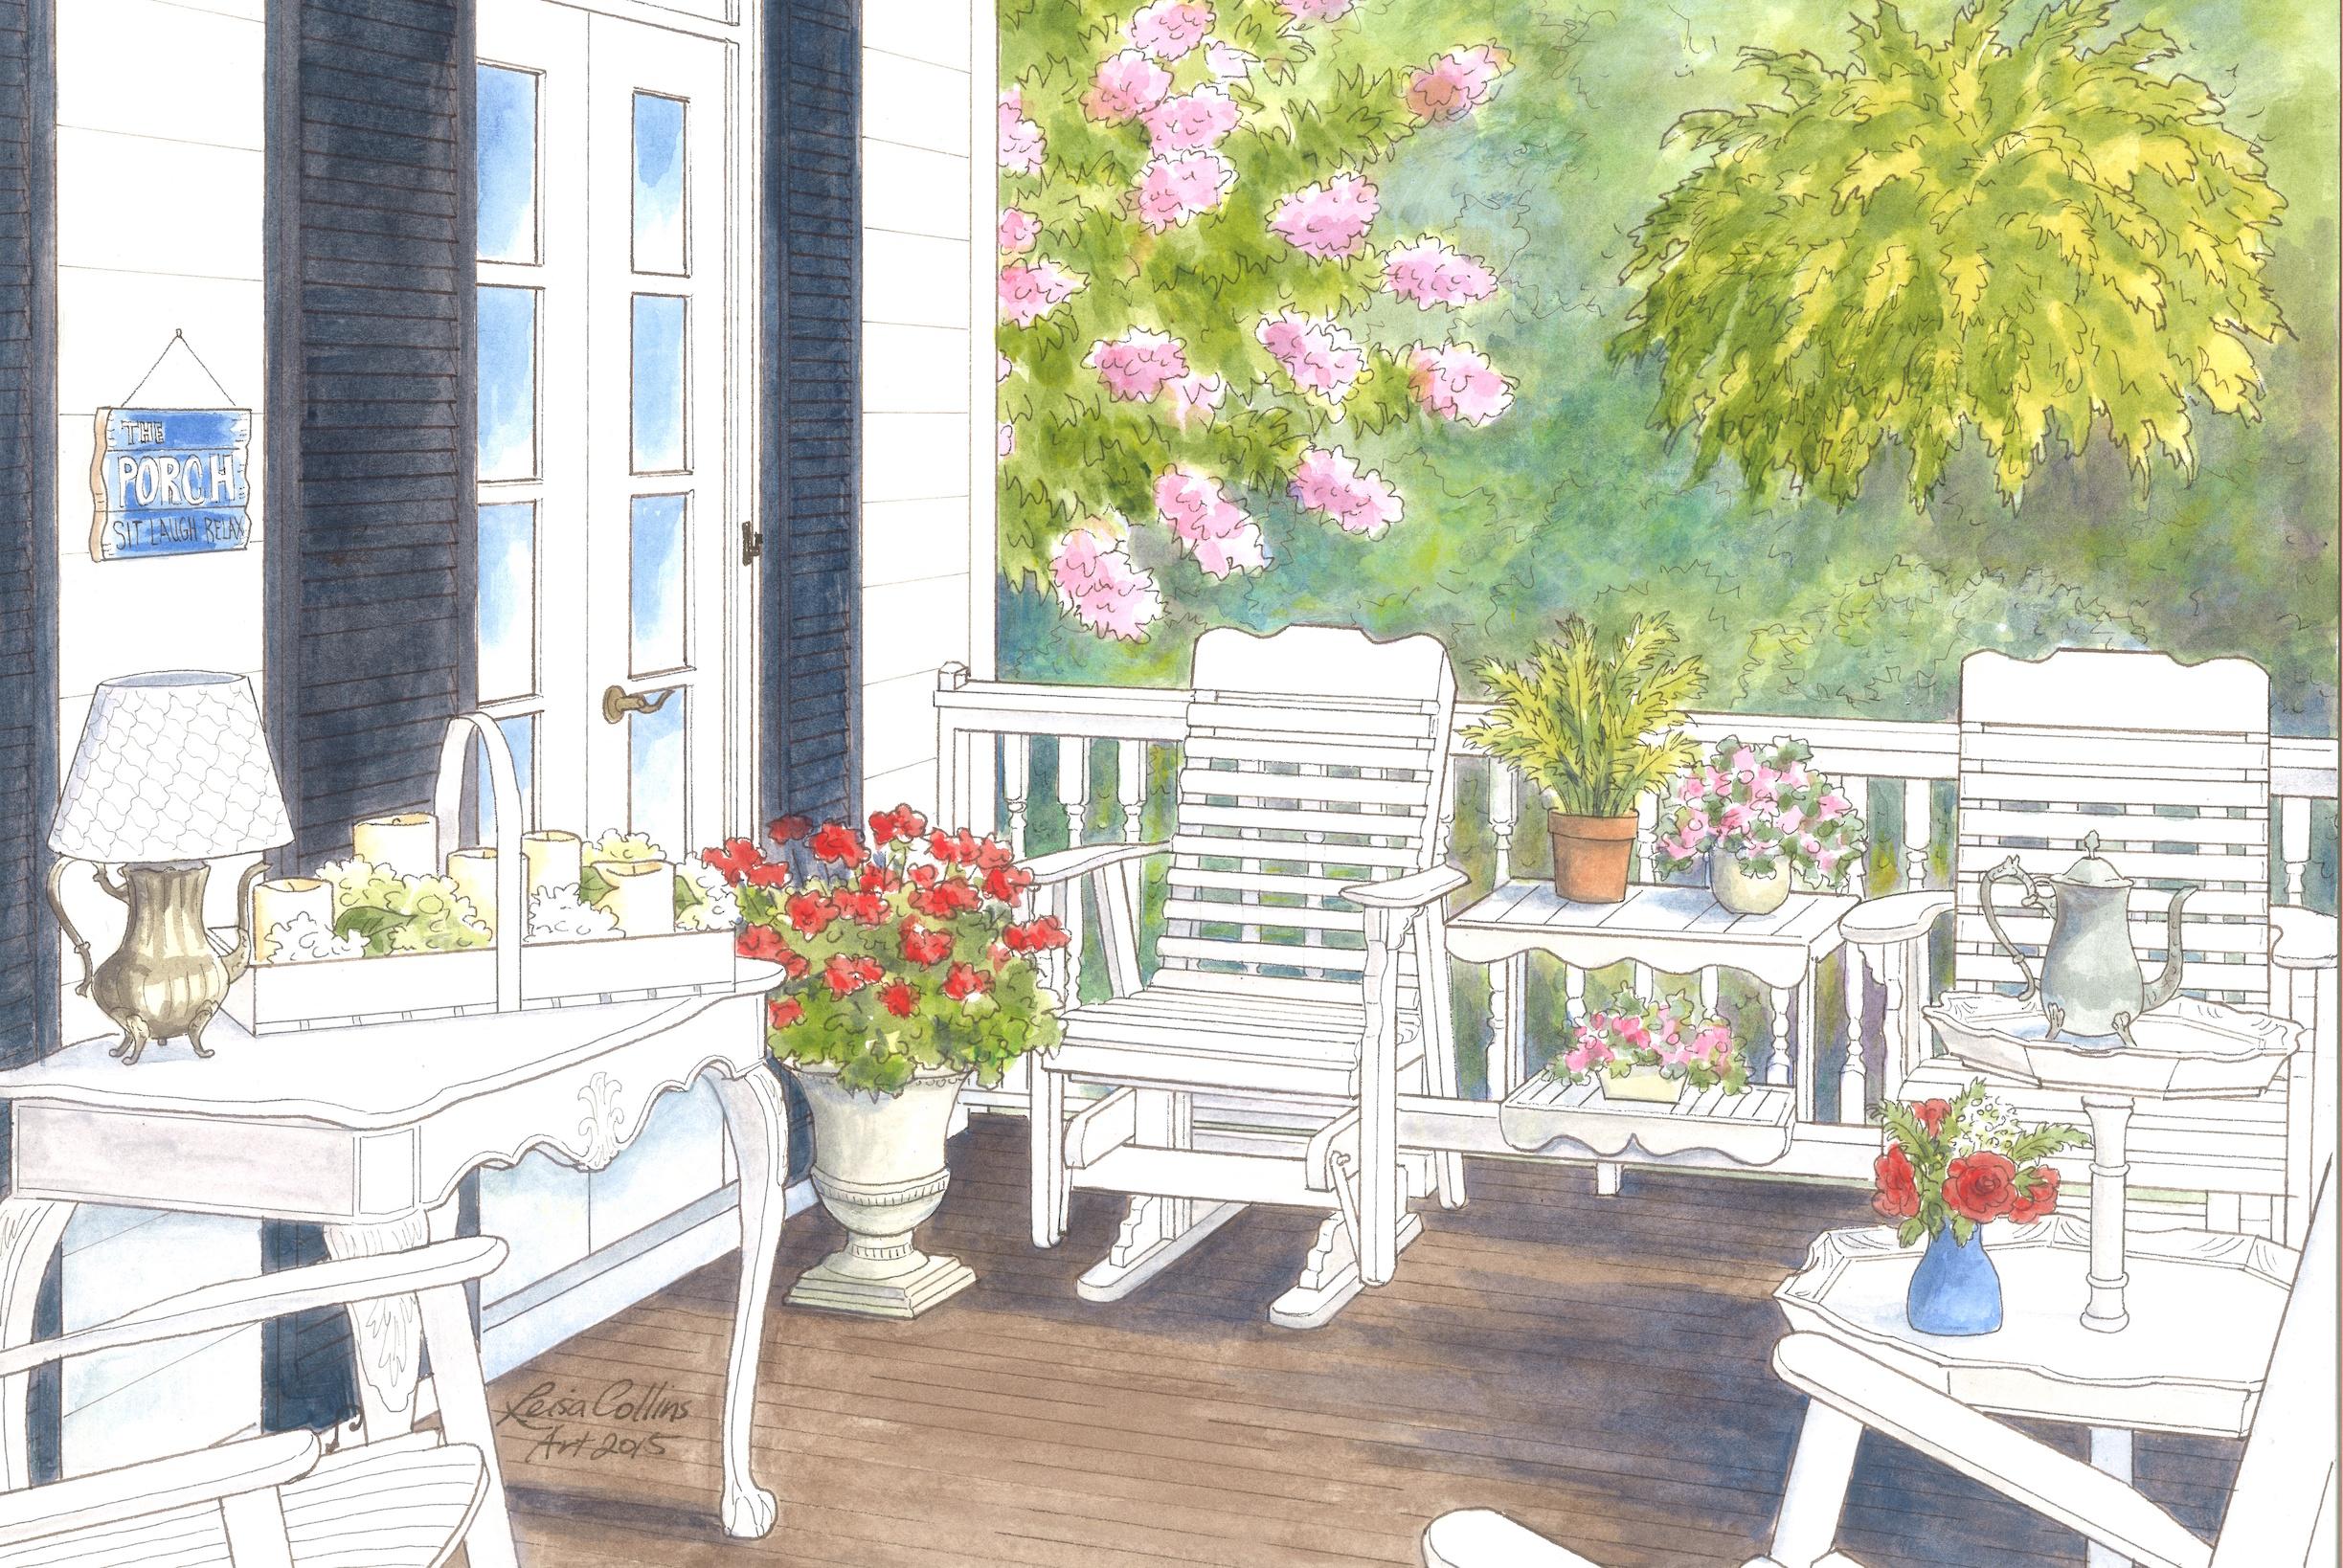 14.-NC-Porch-CompetitionWinner-NC-